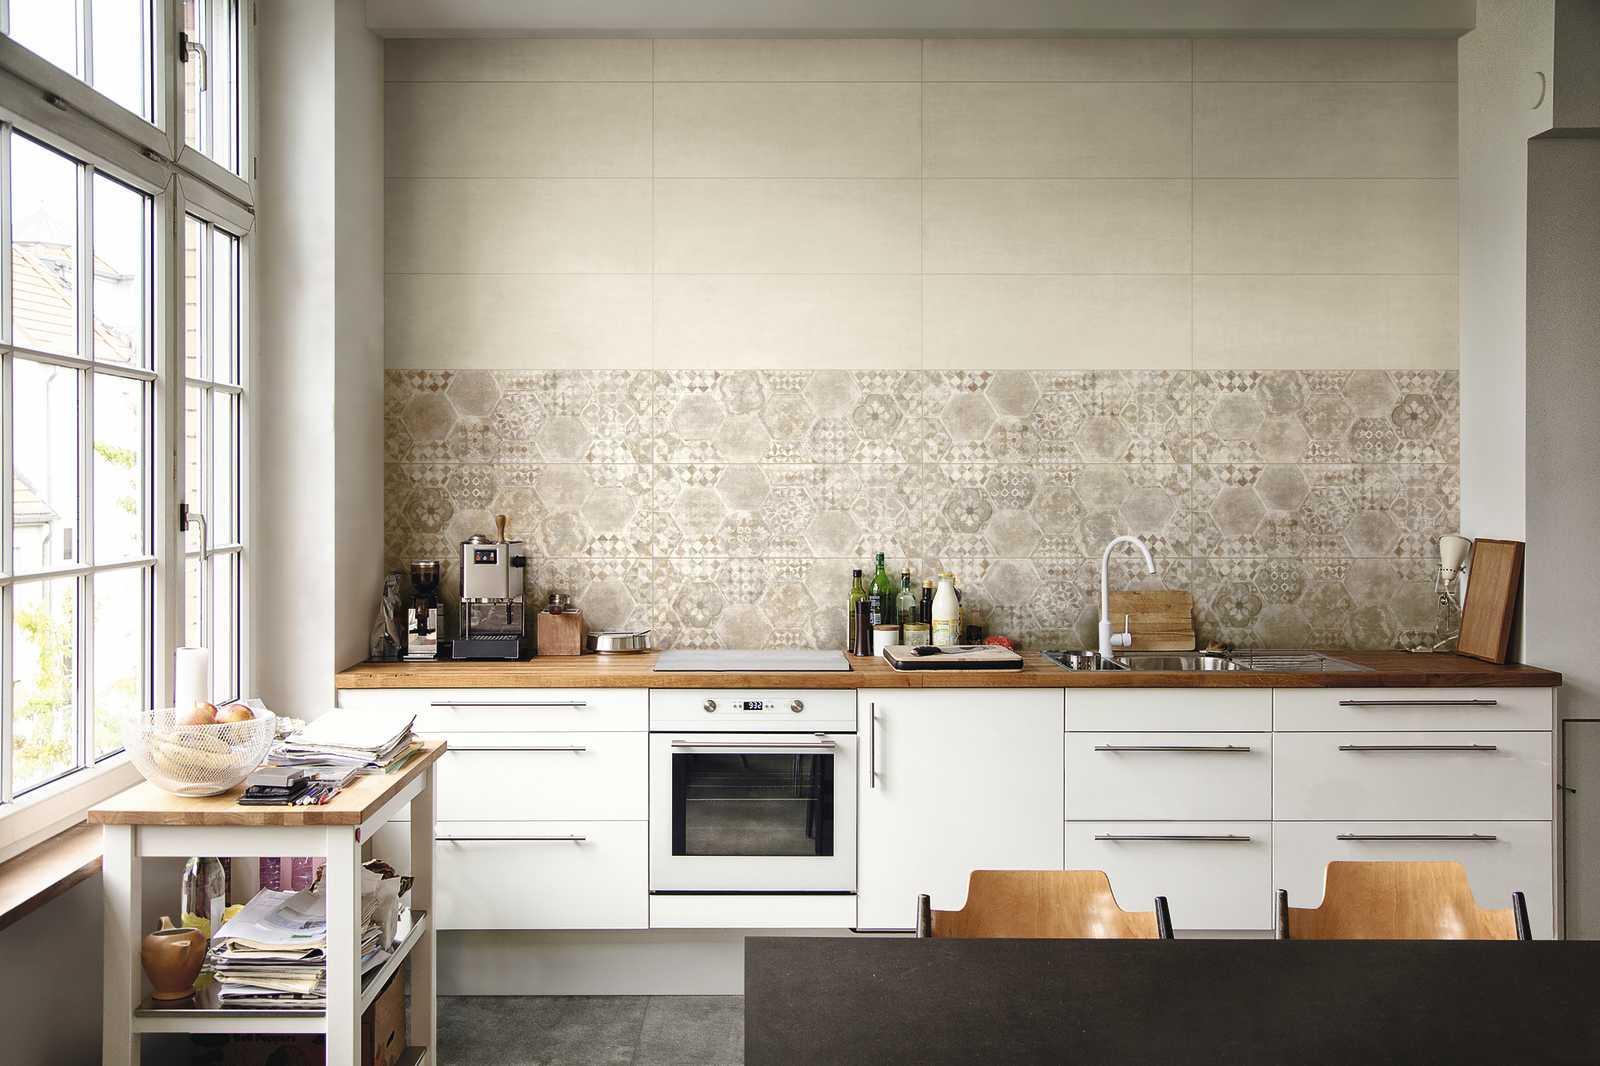 Pannelli Mattonelle Per Cucina - mobili per cucine ...